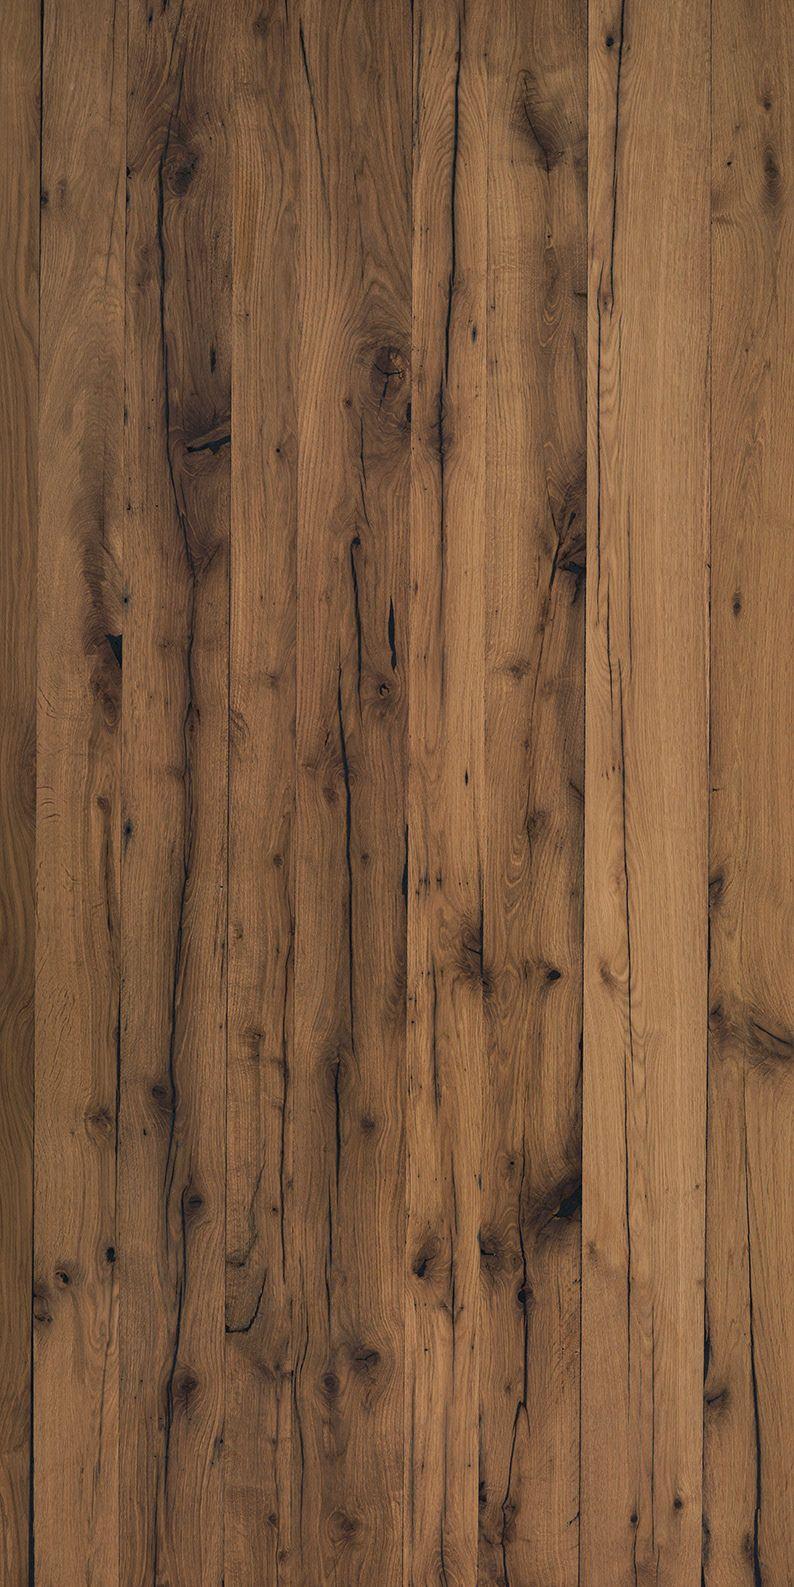 FREE 13 plaats of WOOD Texture OAK VINTAGE HOBOKEN on